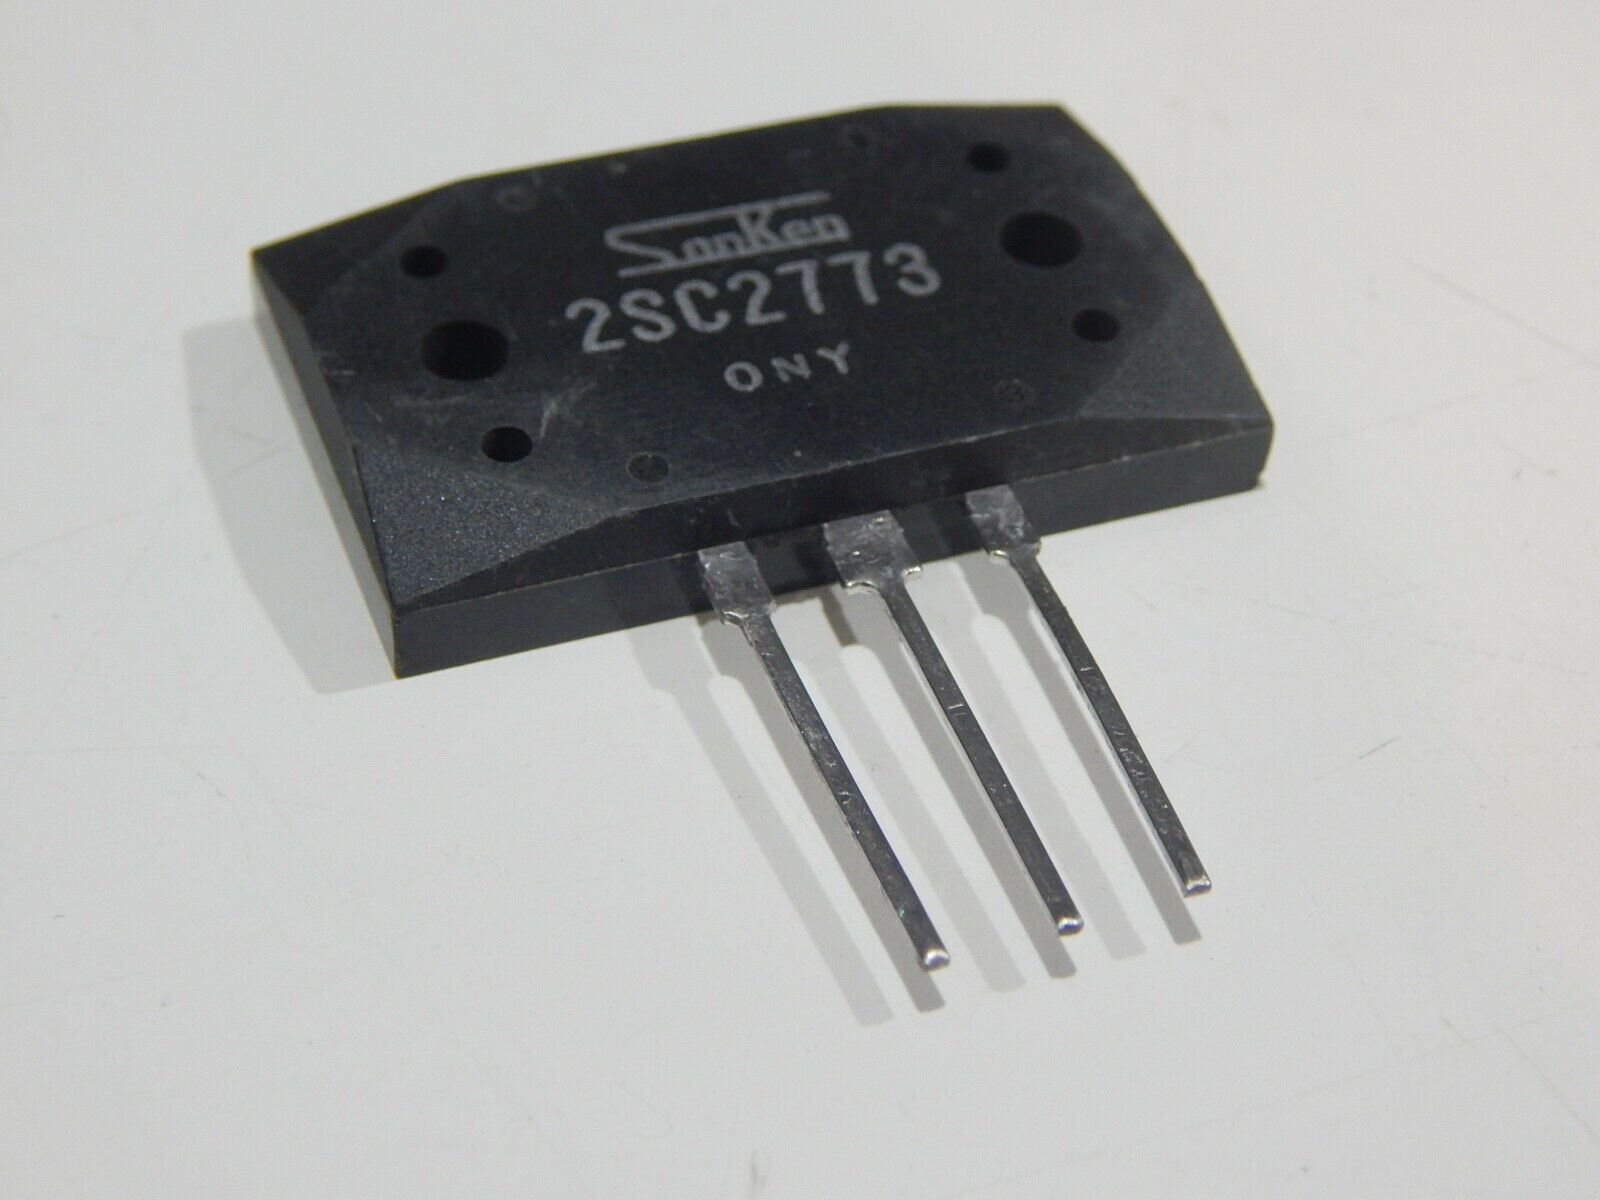 1 pc KSC2073TU  ONSEMI  NPN Transistor  150V 1,5A 25W 4MHz   TO220  NEW